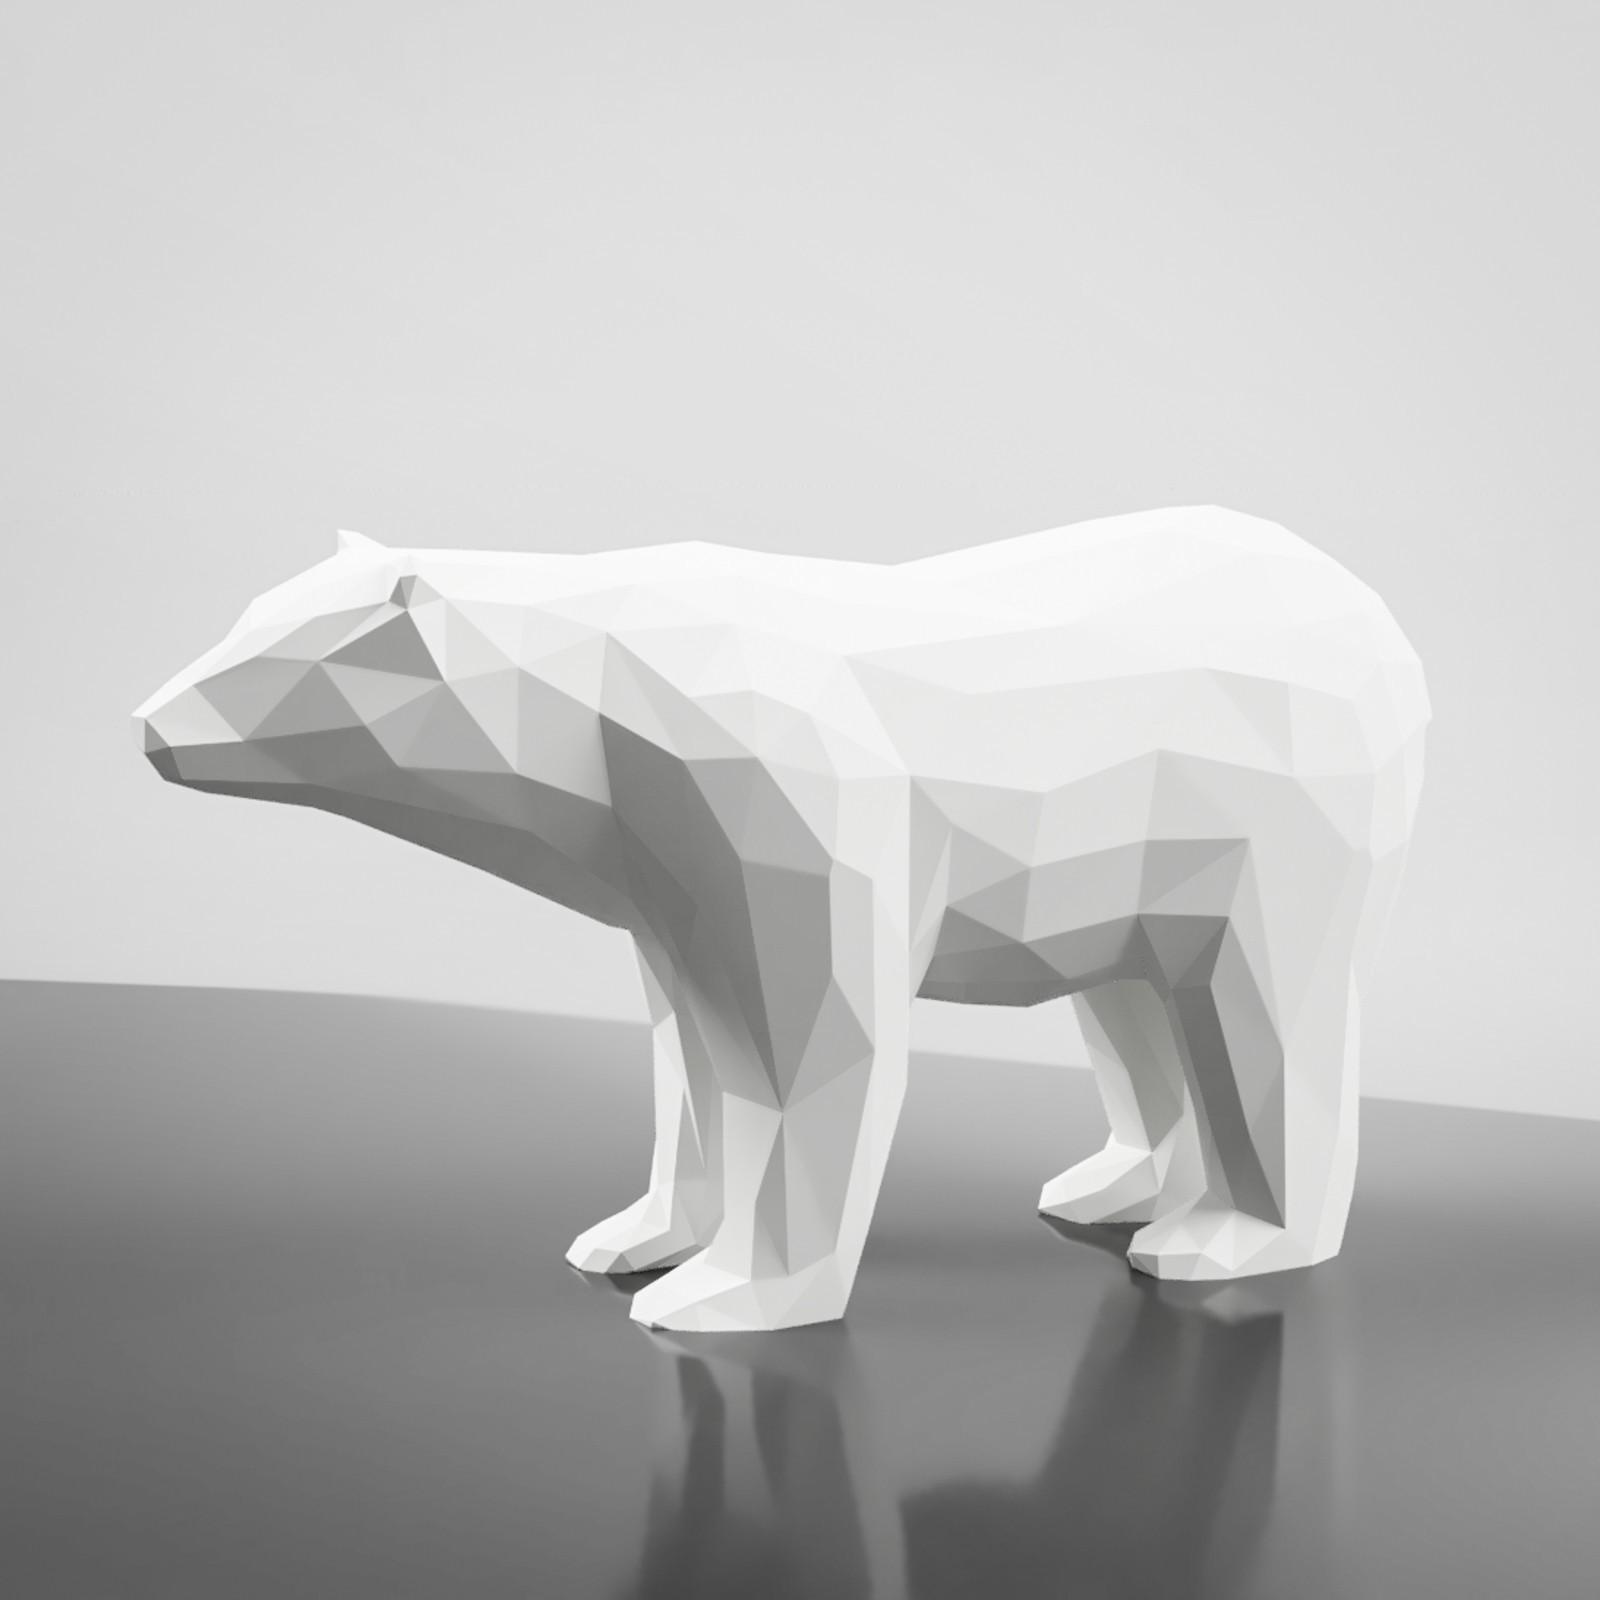 render.jpg Download STL file Low Poly Bear Sculpture 3D Model • 3D printing design, simonprints